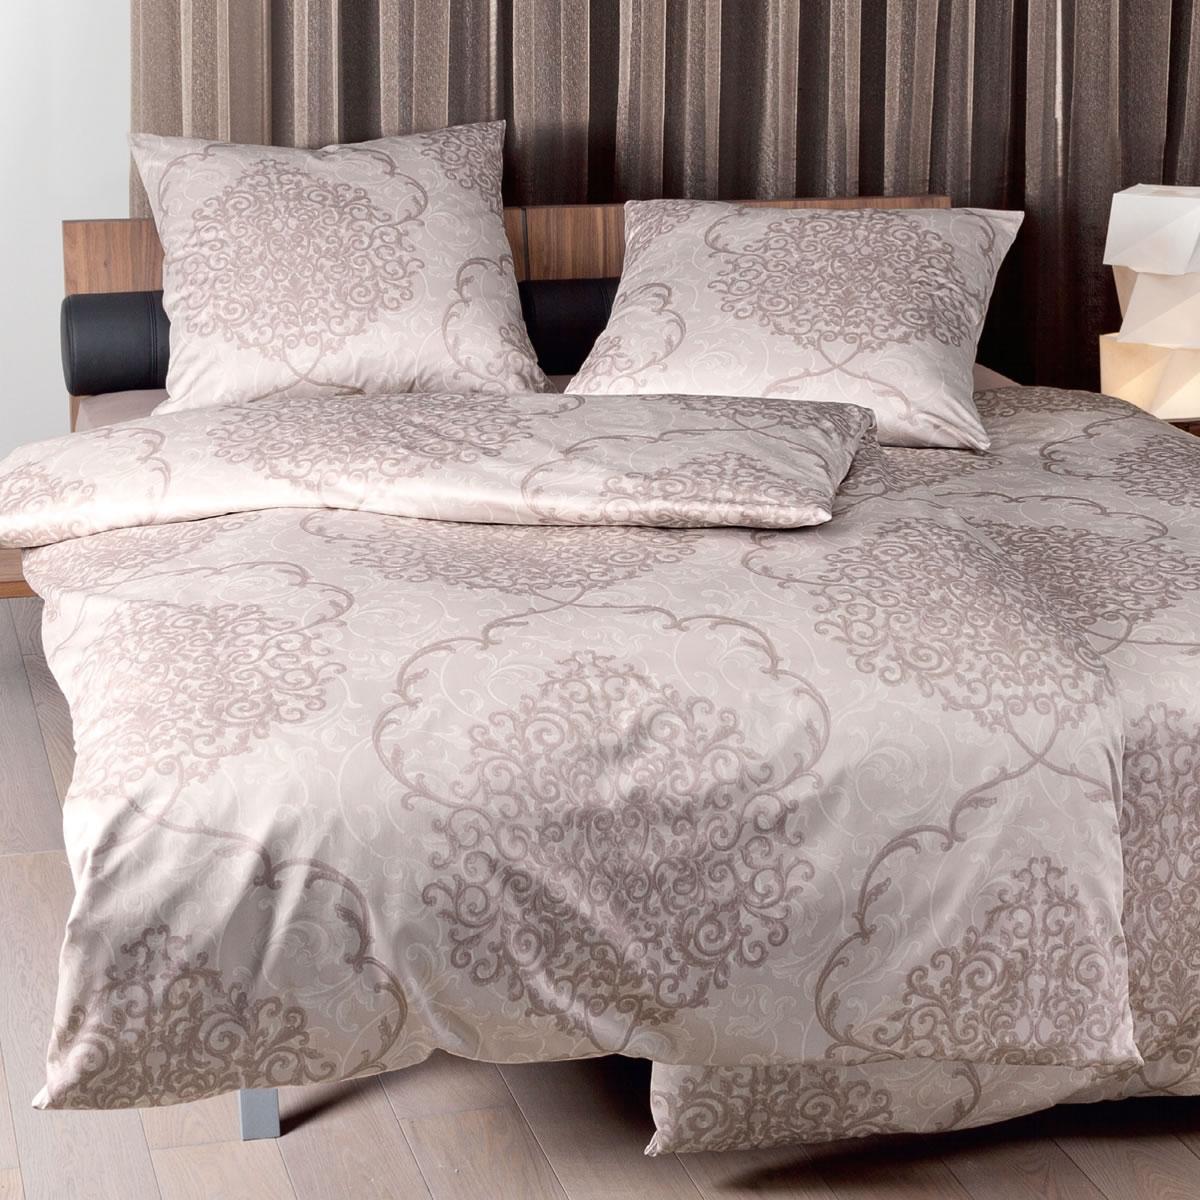 janine mako satin bettw sche messina 43015 07 sand braun ornamente. Black Bedroom Furniture Sets. Home Design Ideas